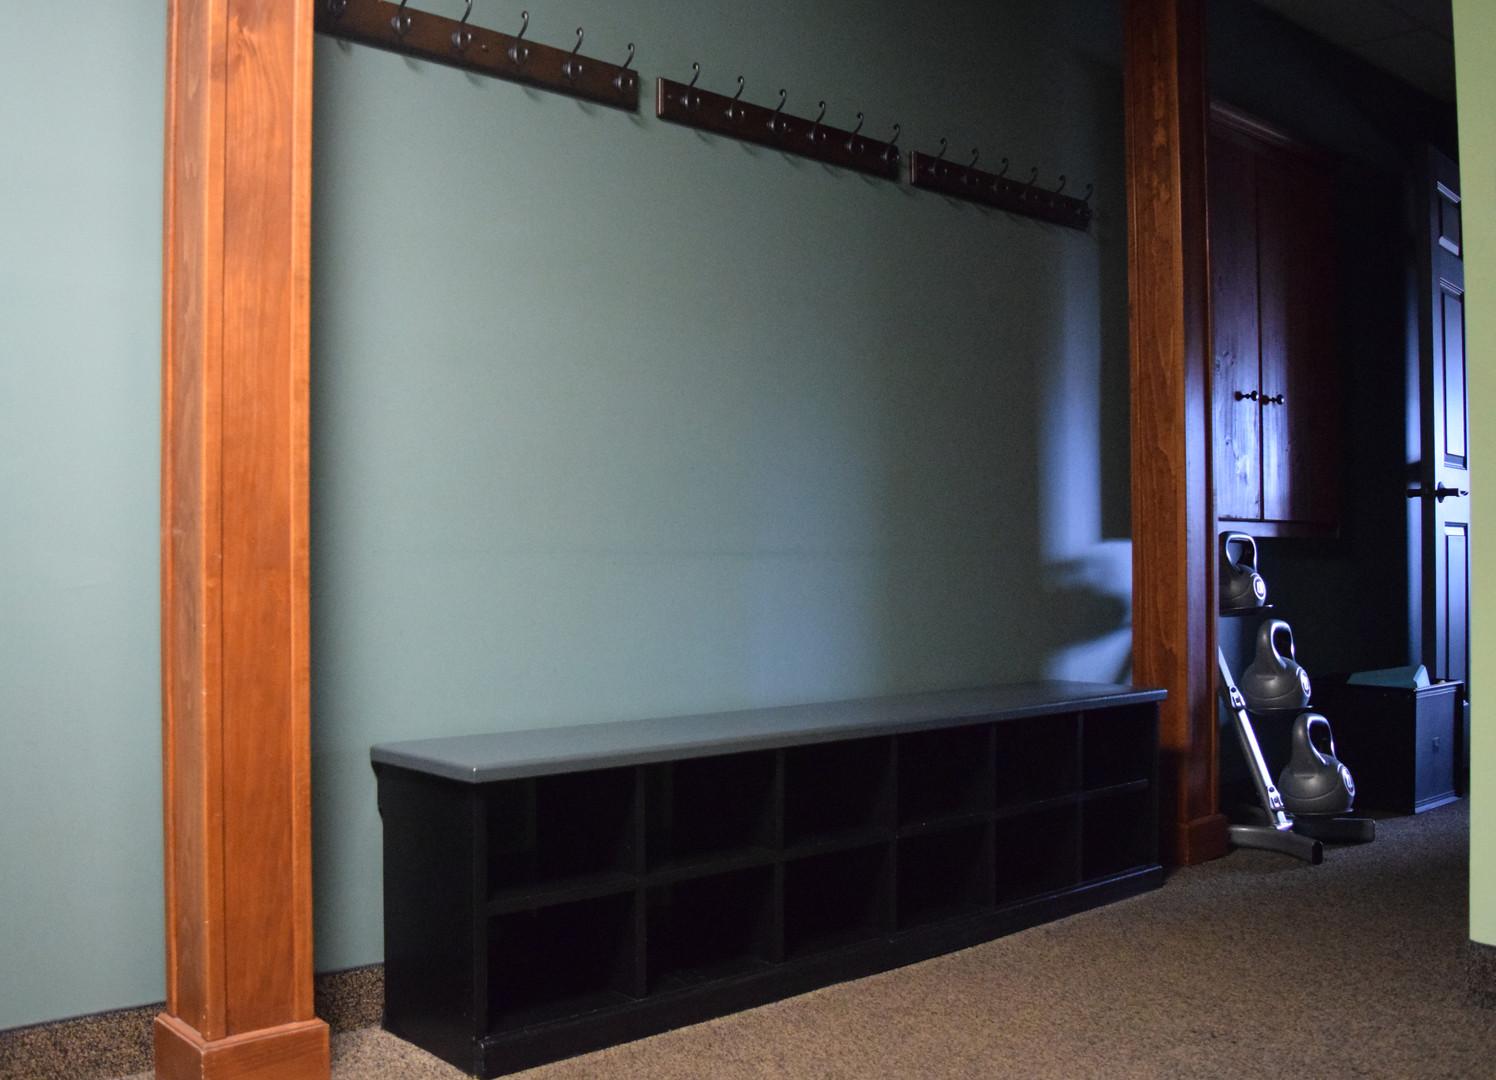 Hallway to studio space